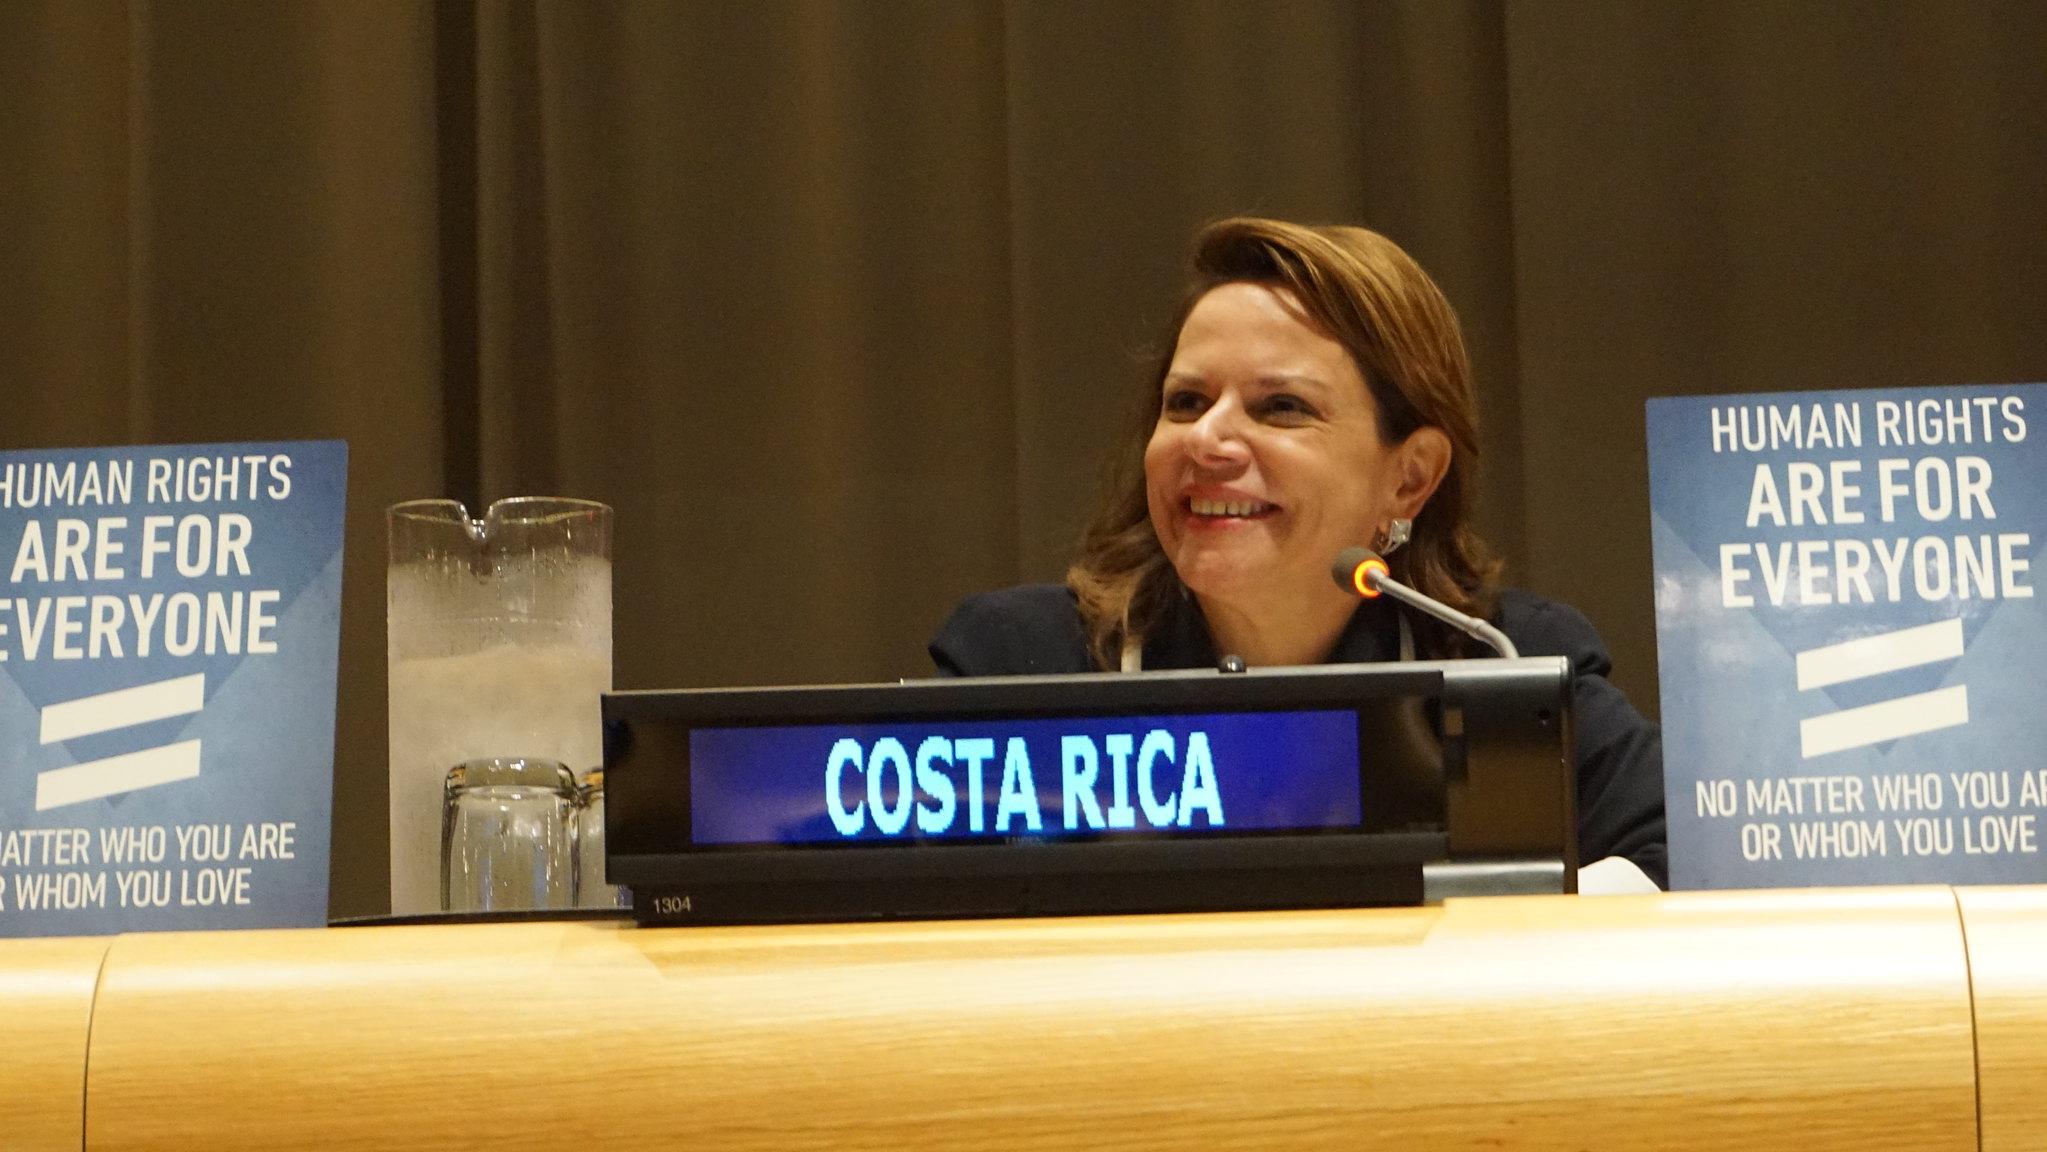 Ana Helena Chacon Escheverria, Vice President of Costa Rica